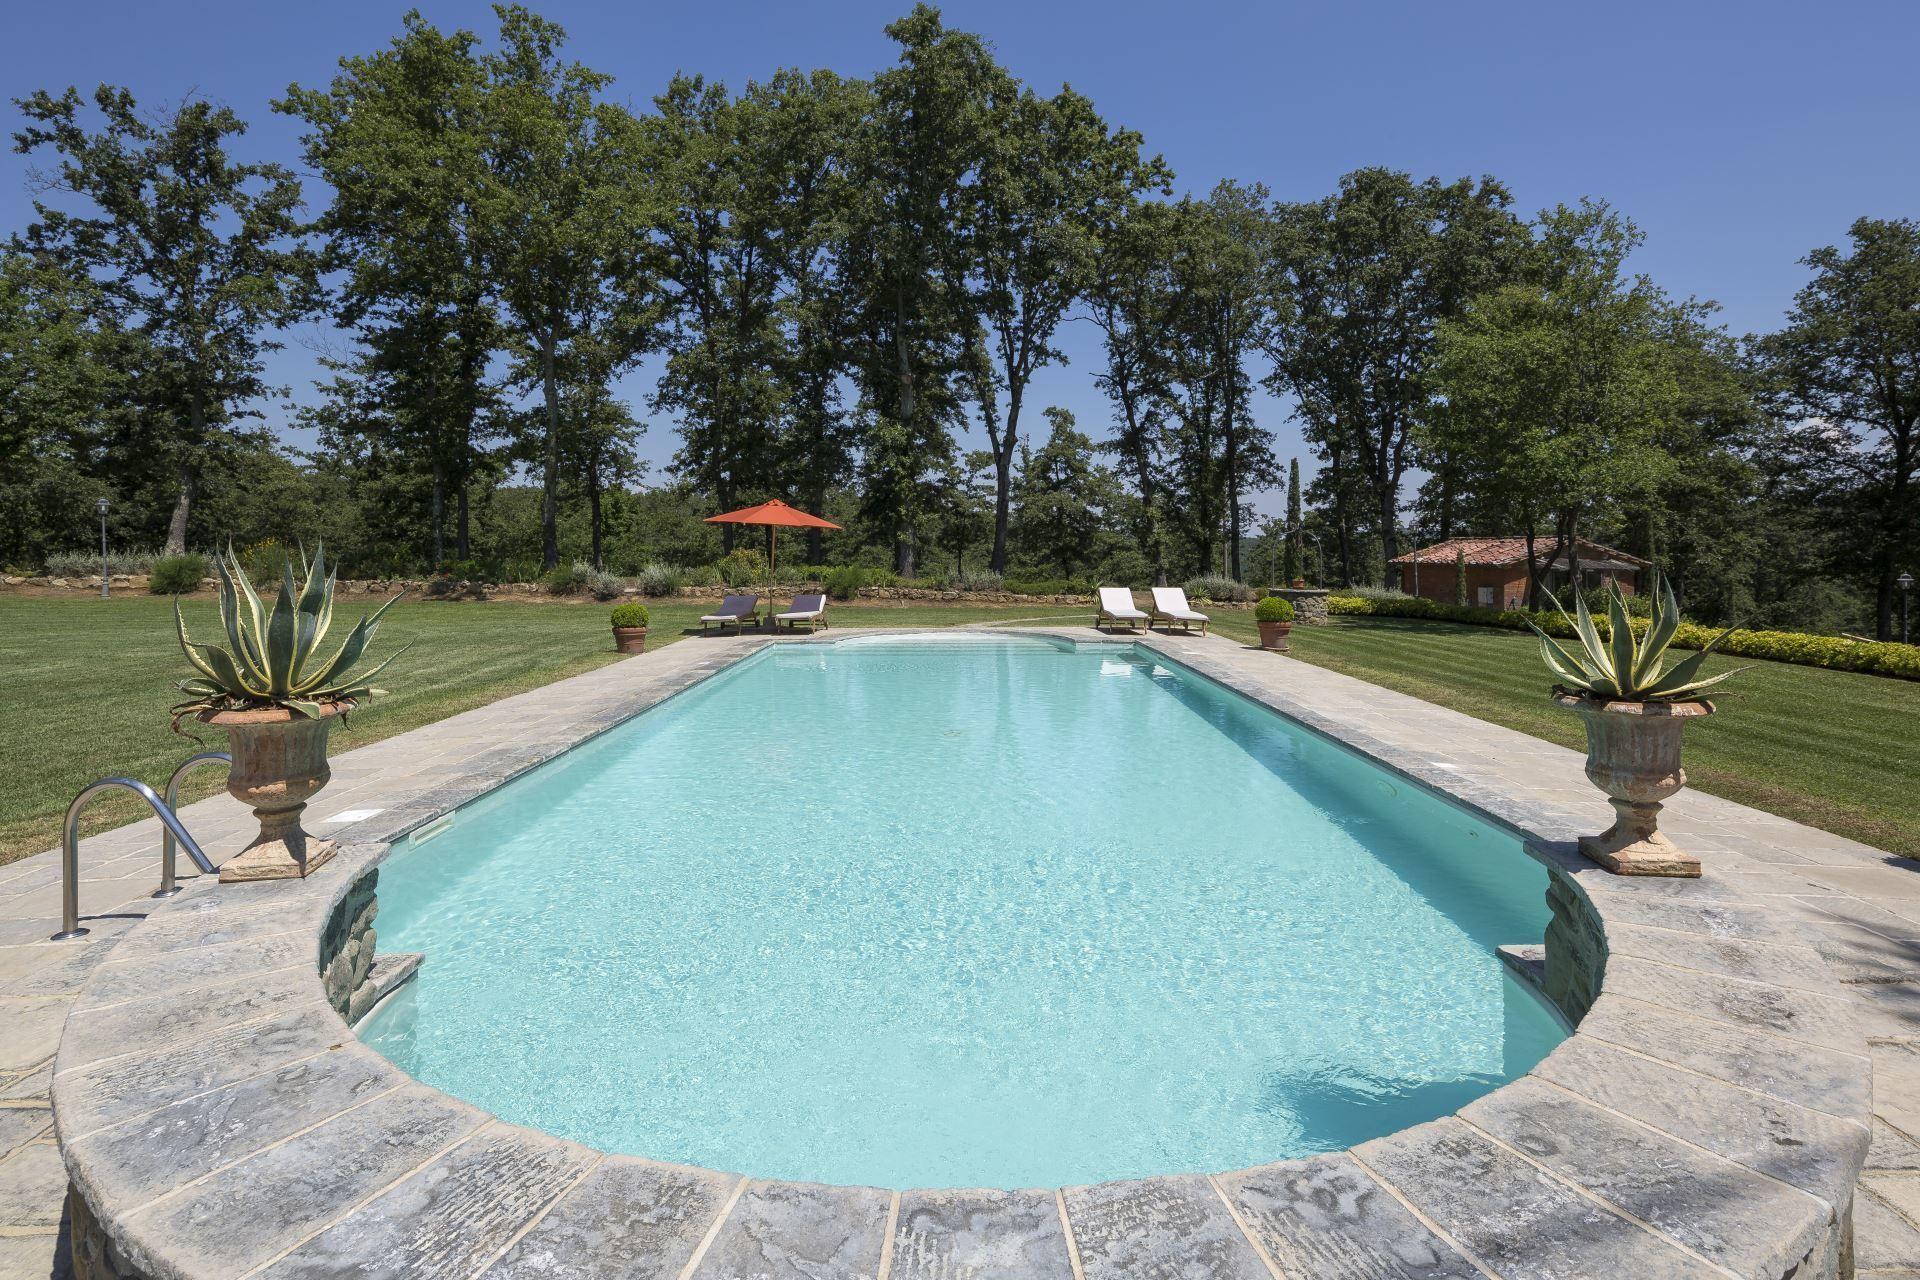 Villa La Selva - Ferienhäuser Toskana für Personen mit ...